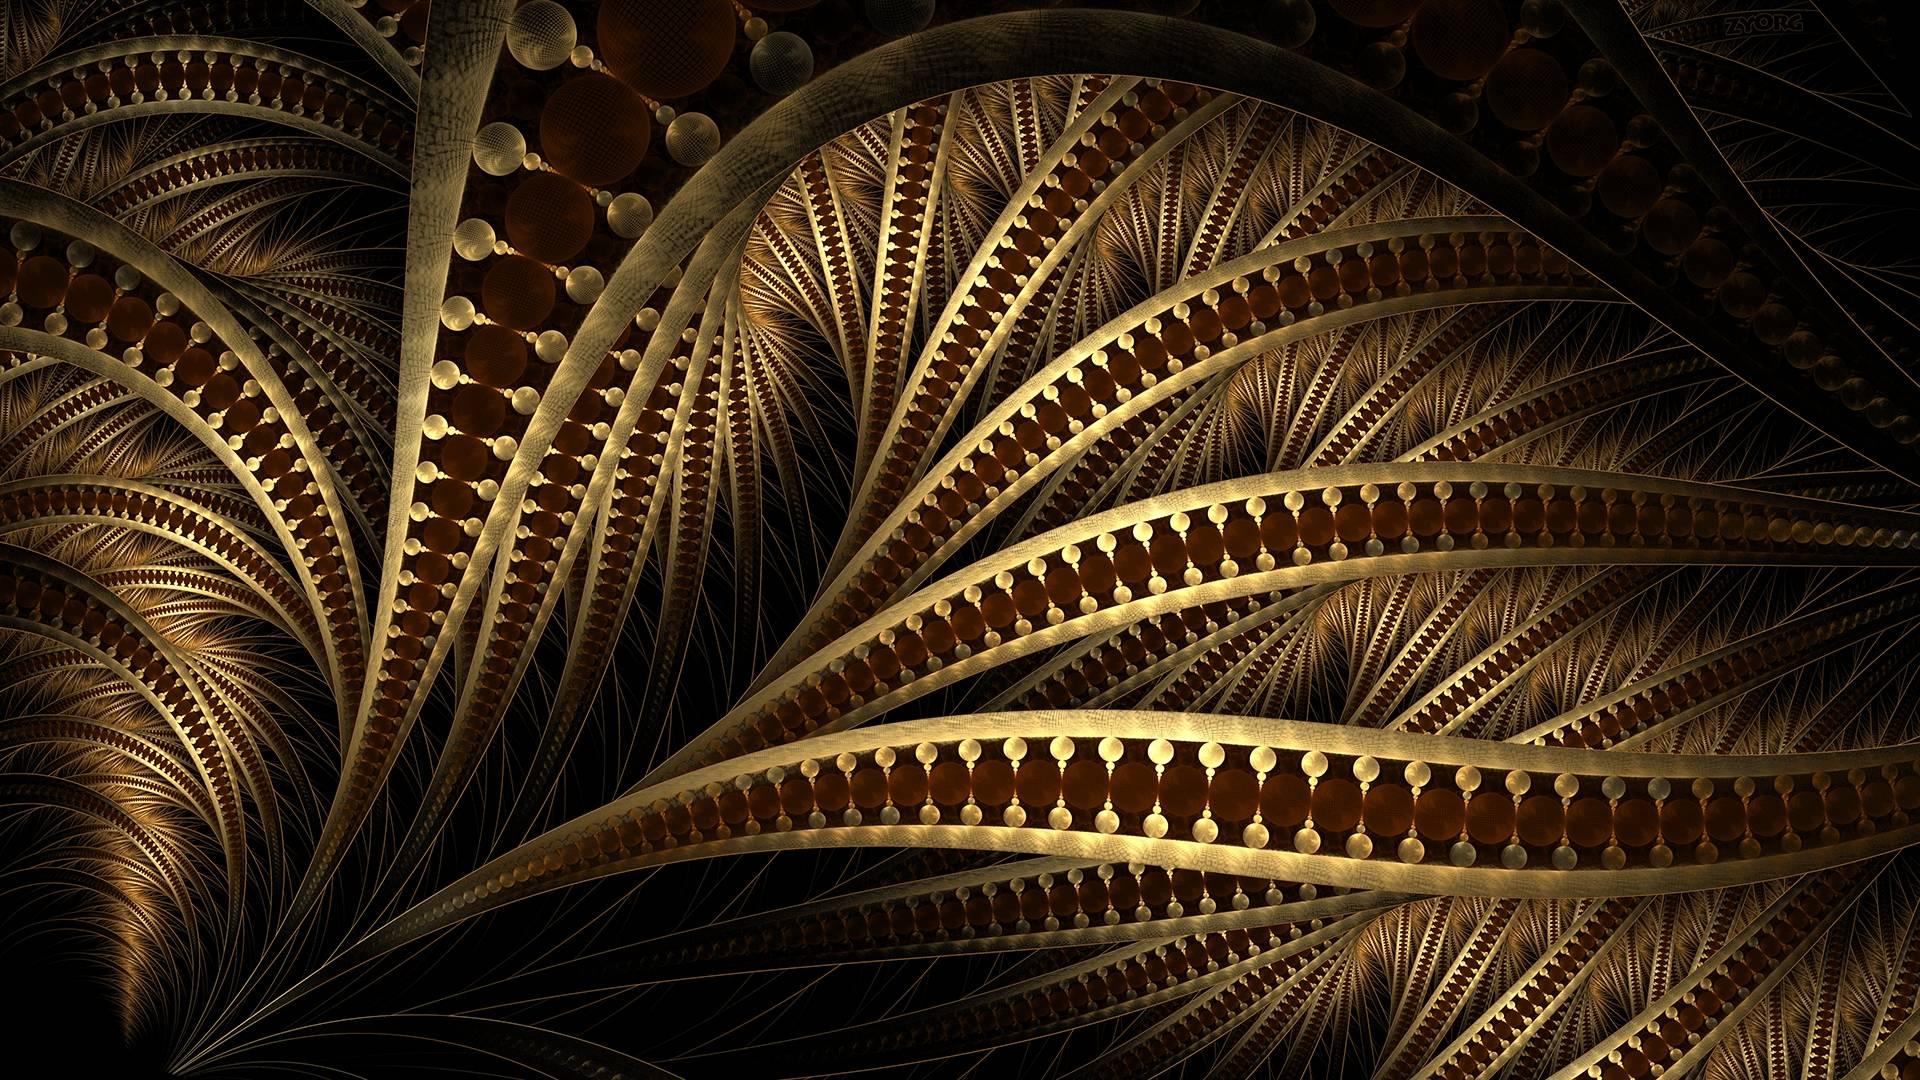 Hd Fractals Wallpapers 1080p: 3D Fractal Wallpapers